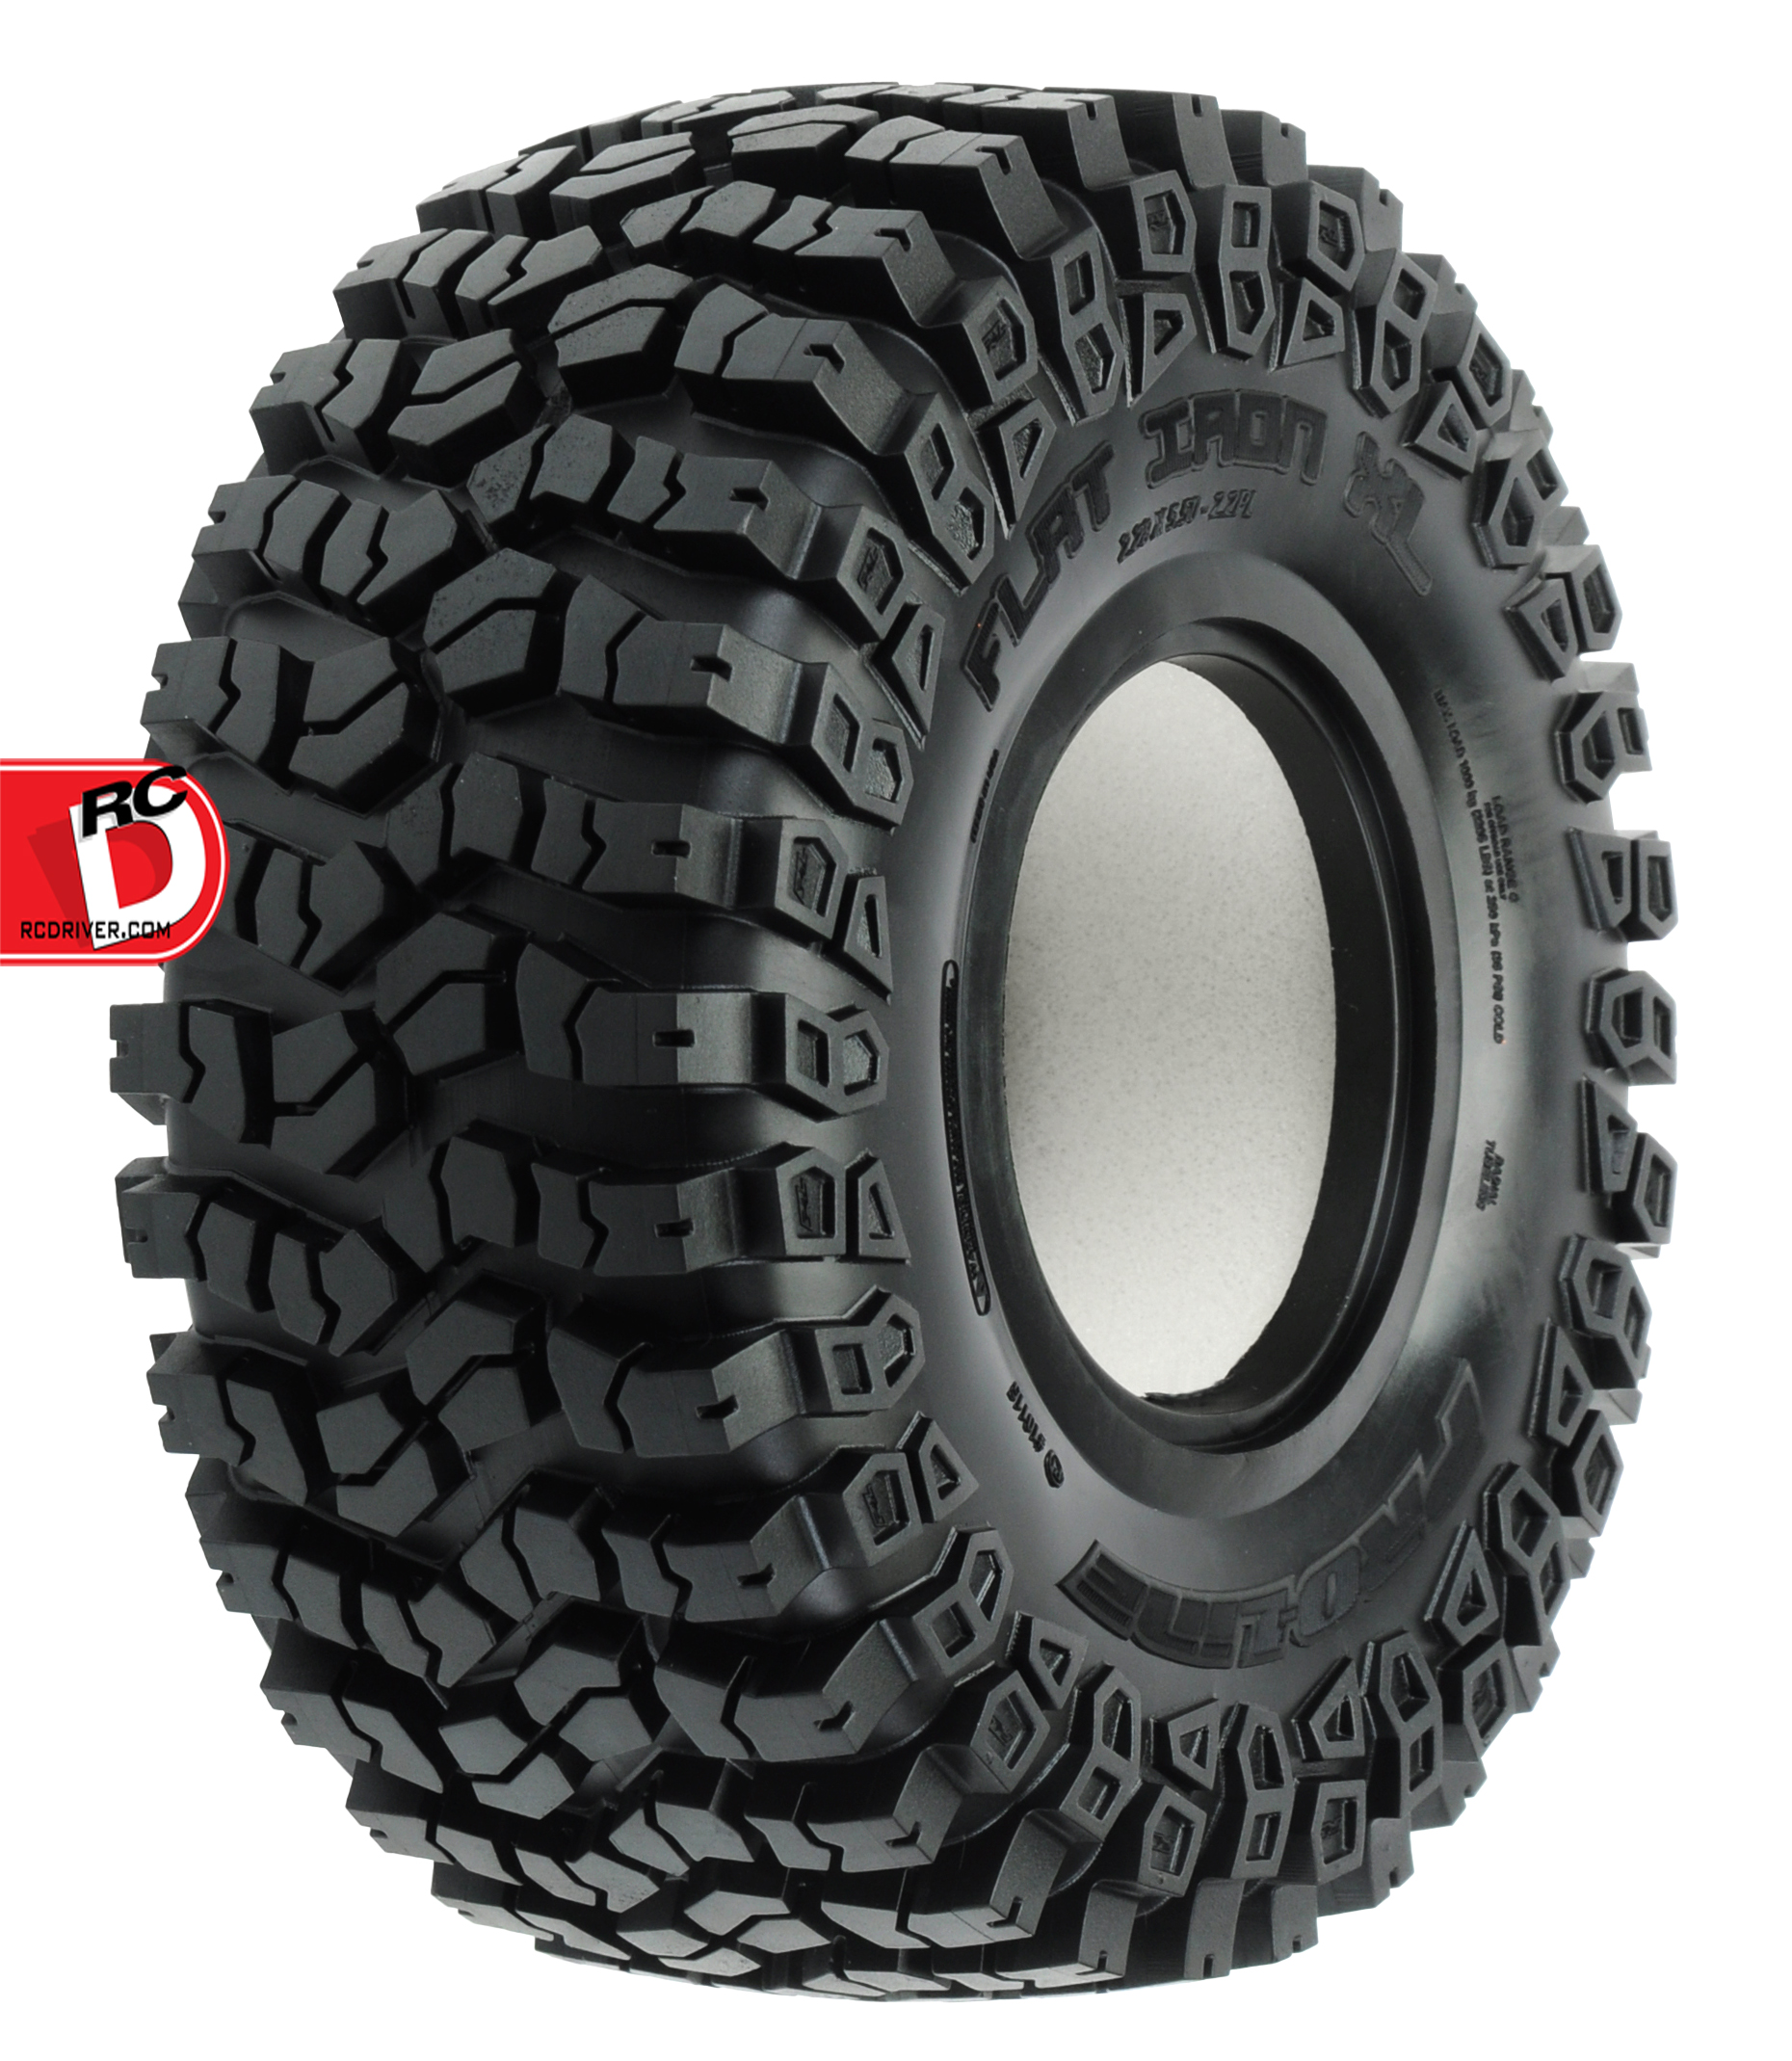 pro line flat iron xl 2 2 g8 rock terrain truck tires with memory foam. Black Bedroom Furniture Sets. Home Design Ideas